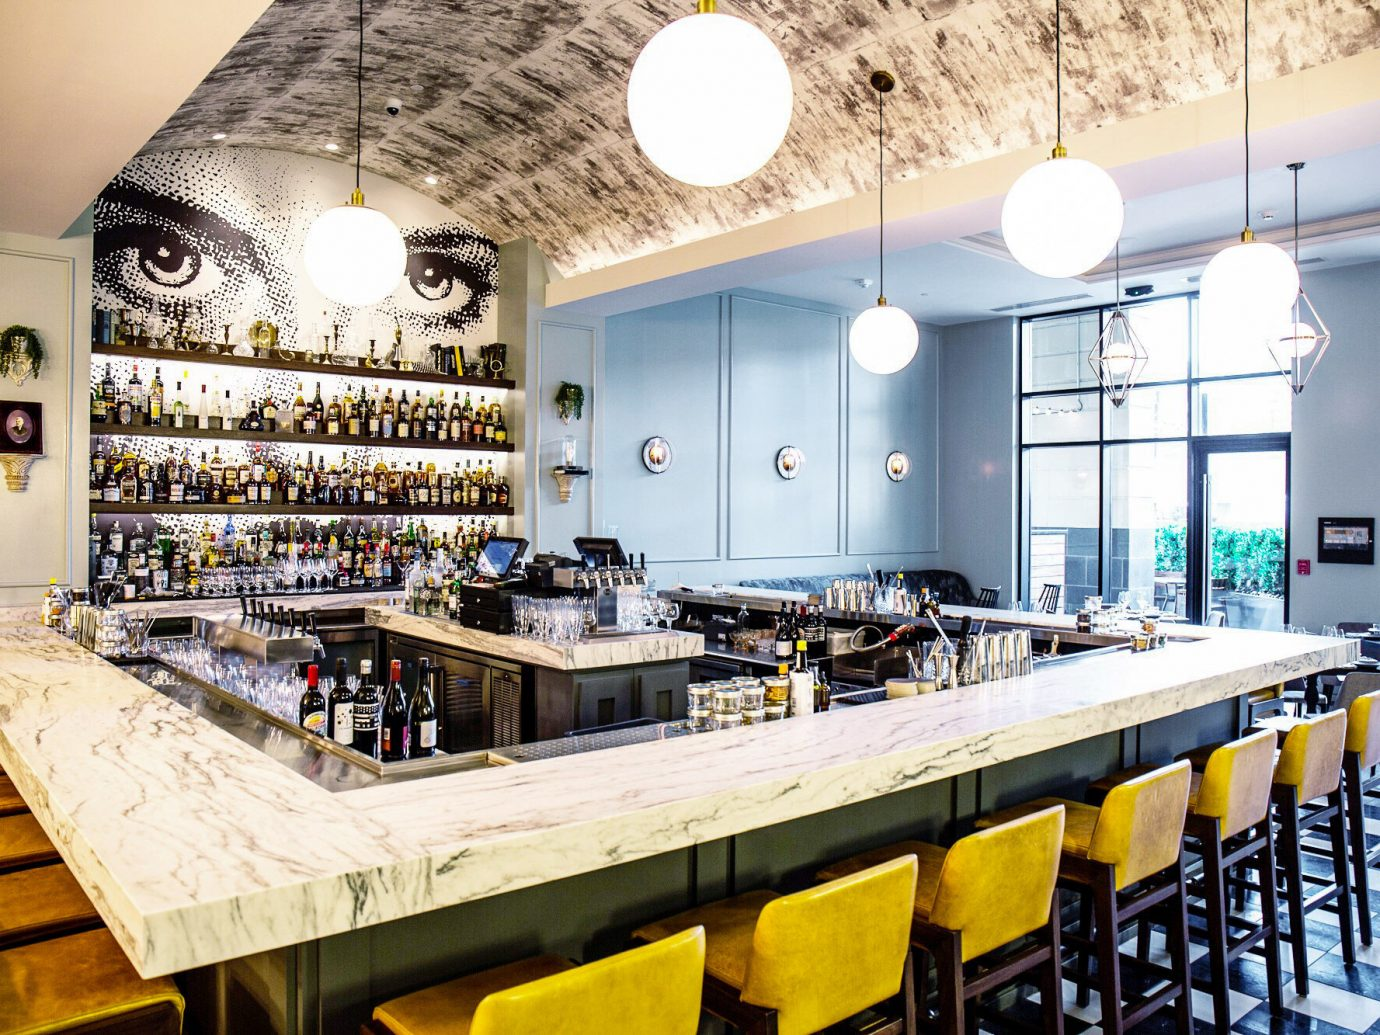 Trip Ideas Weekend Getaways indoor restaurant interior design café area